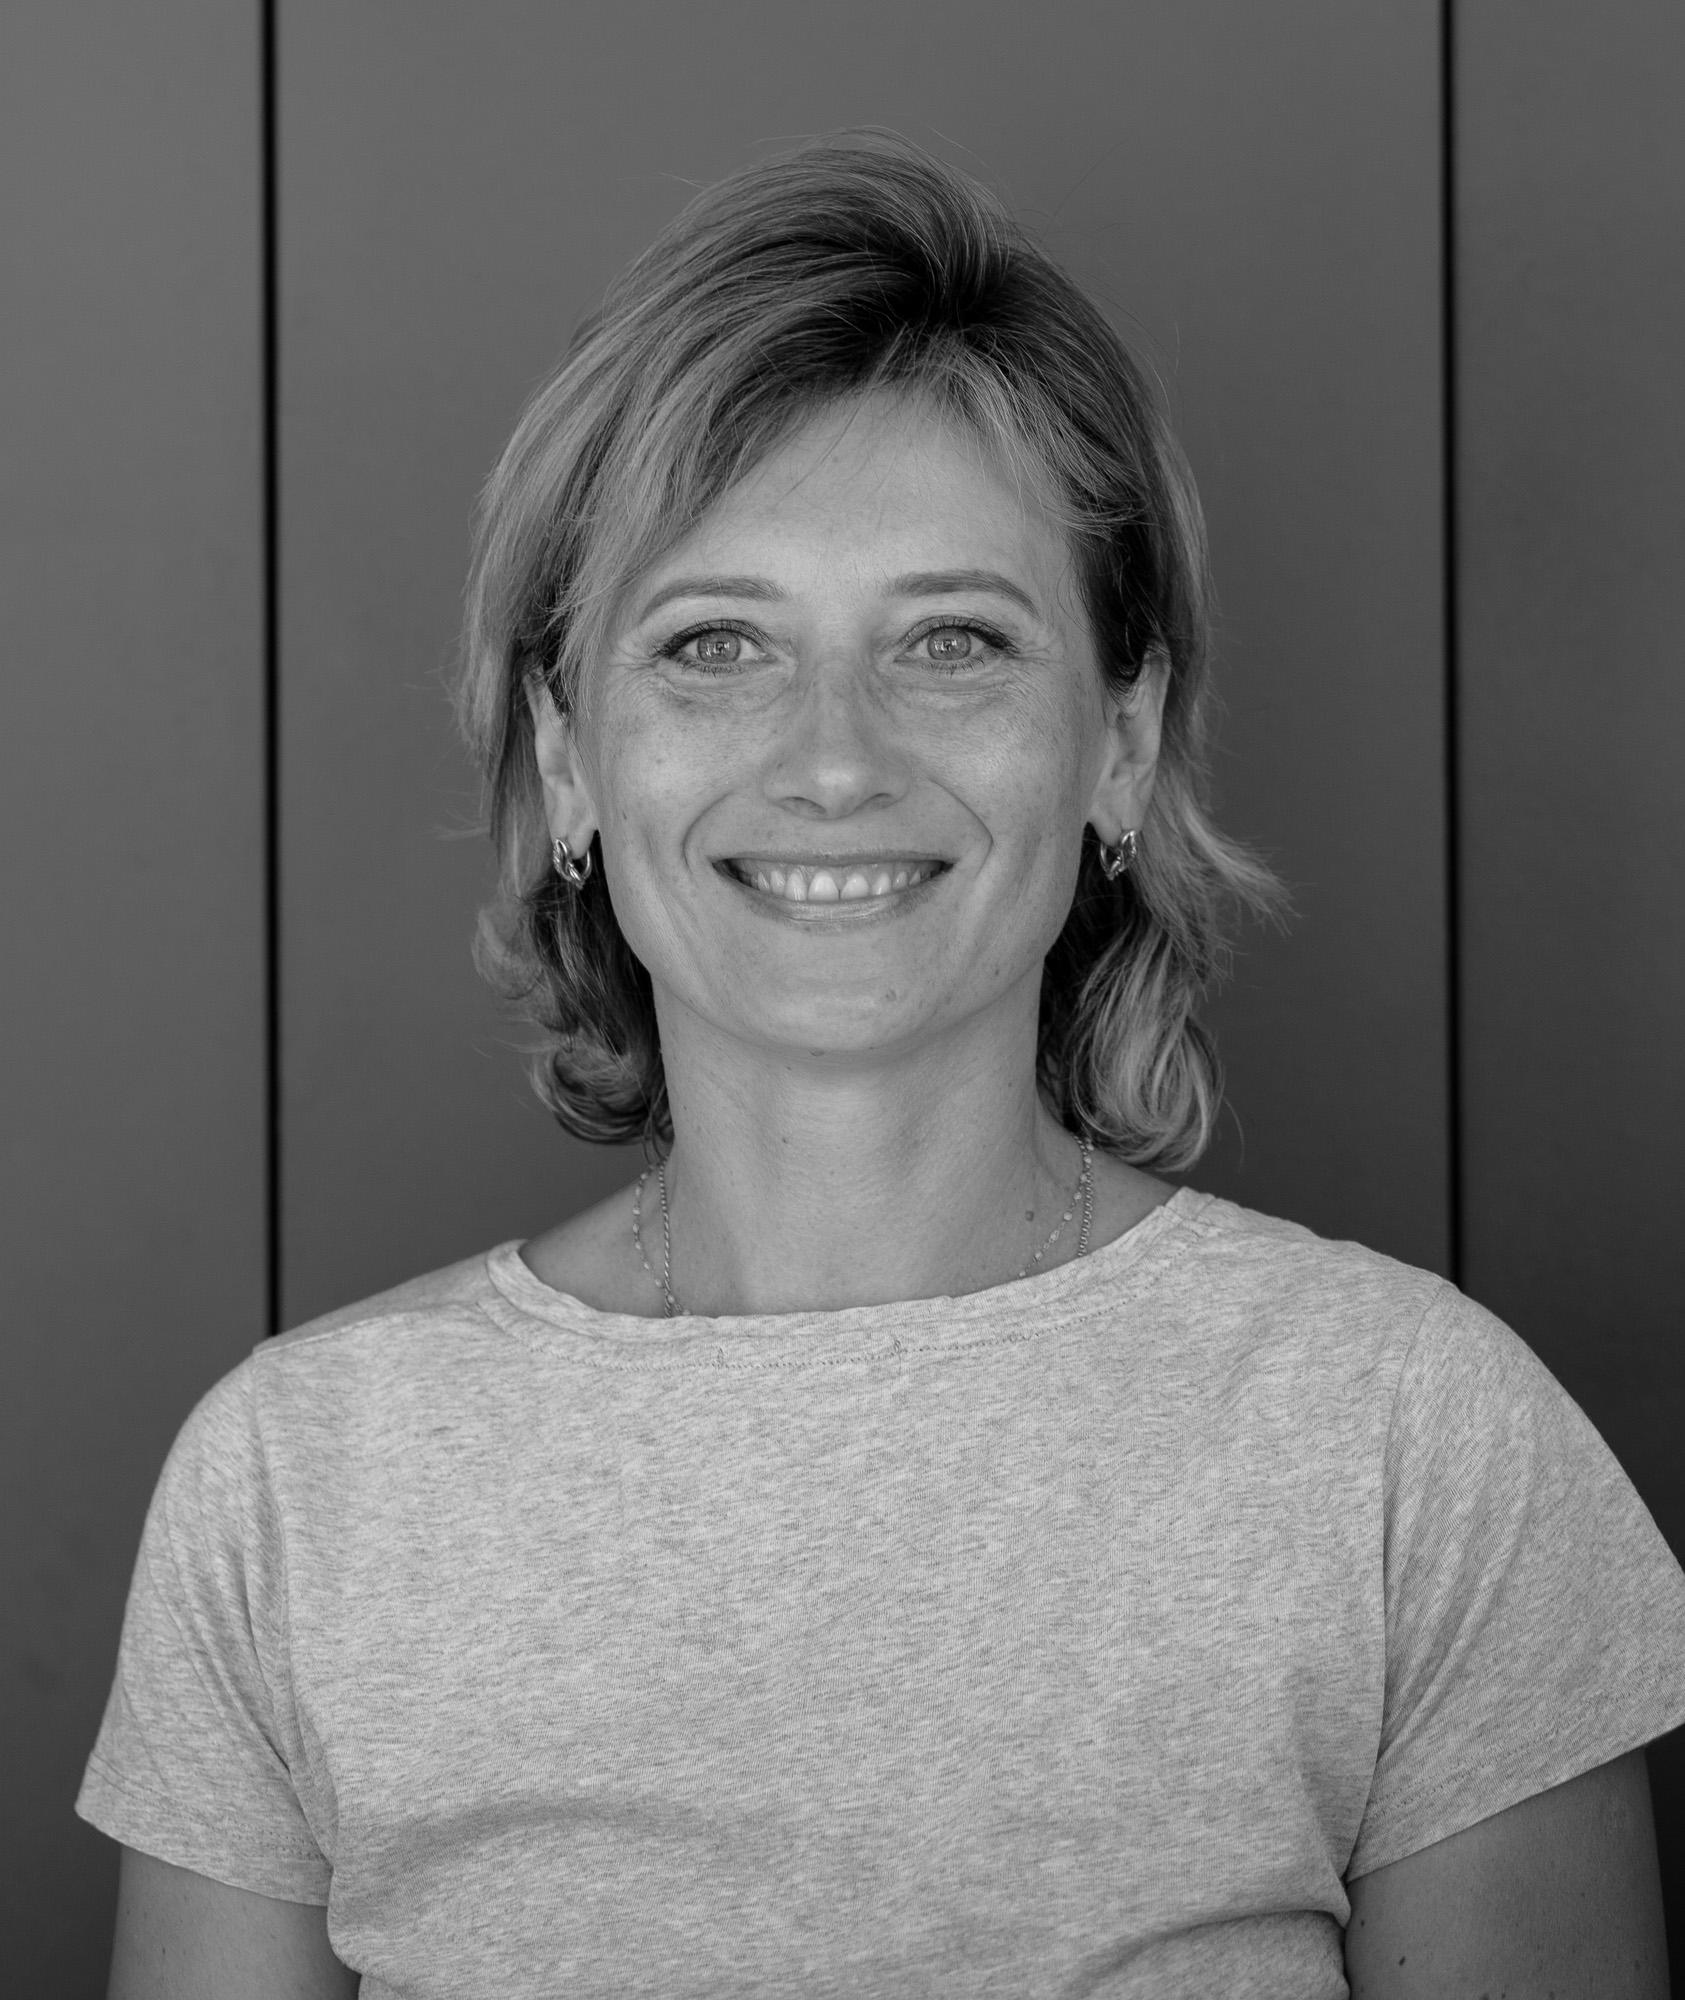 Yulia Huber